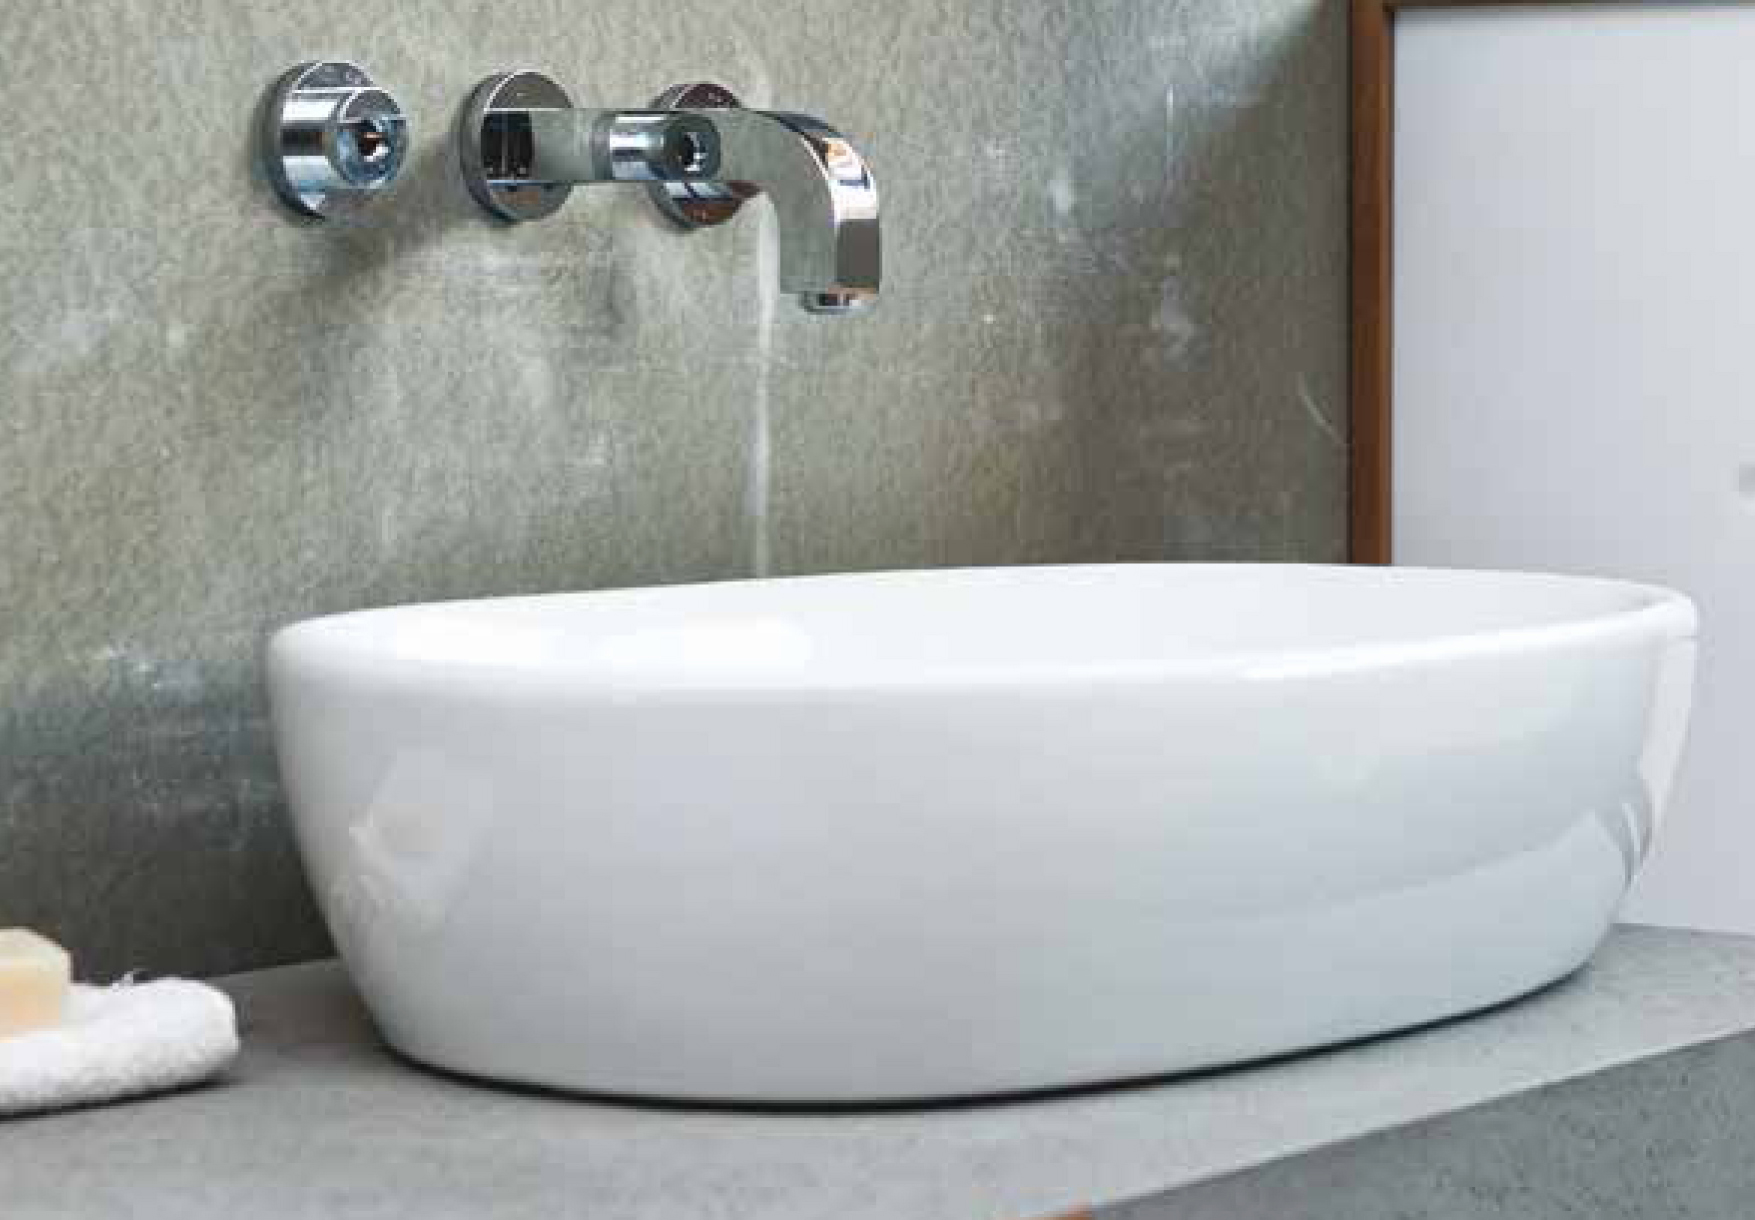 Aquatek GO keramické umyvadlo 58,5 x 40,5 x 13,5 cm